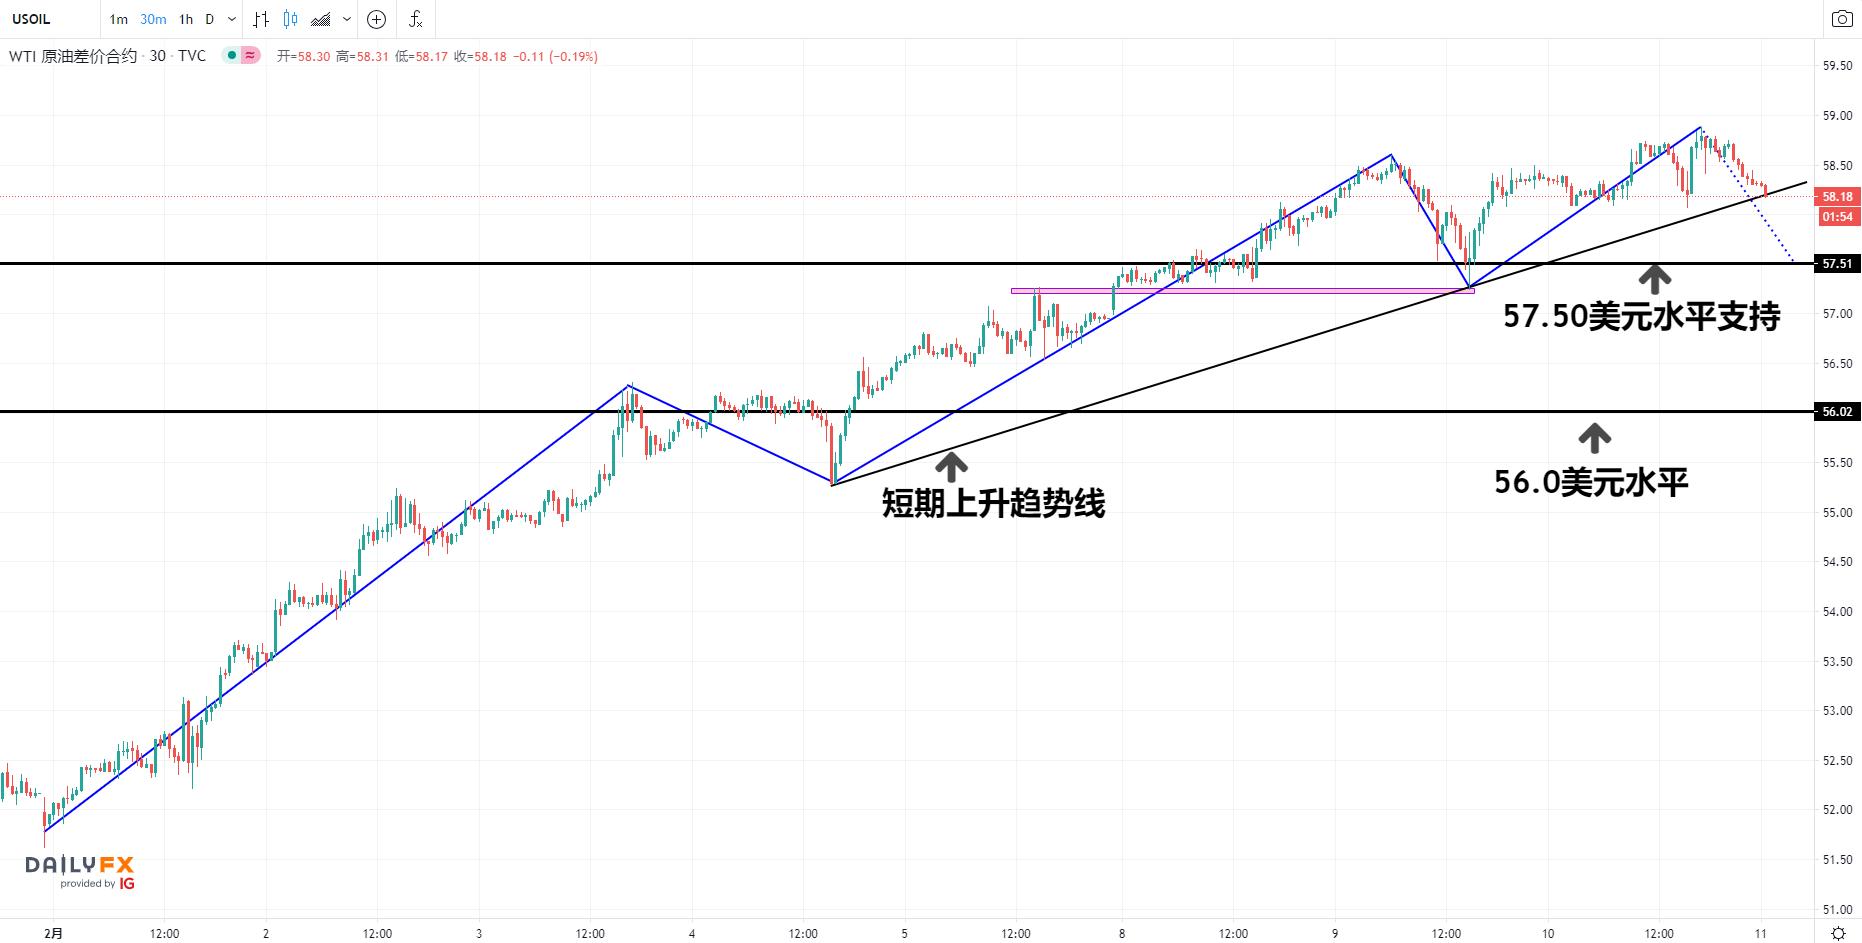 WTI原油:樂觀情緒降溫,美元止跌回升!油價終結七連漲或存構築階段頂部風險!